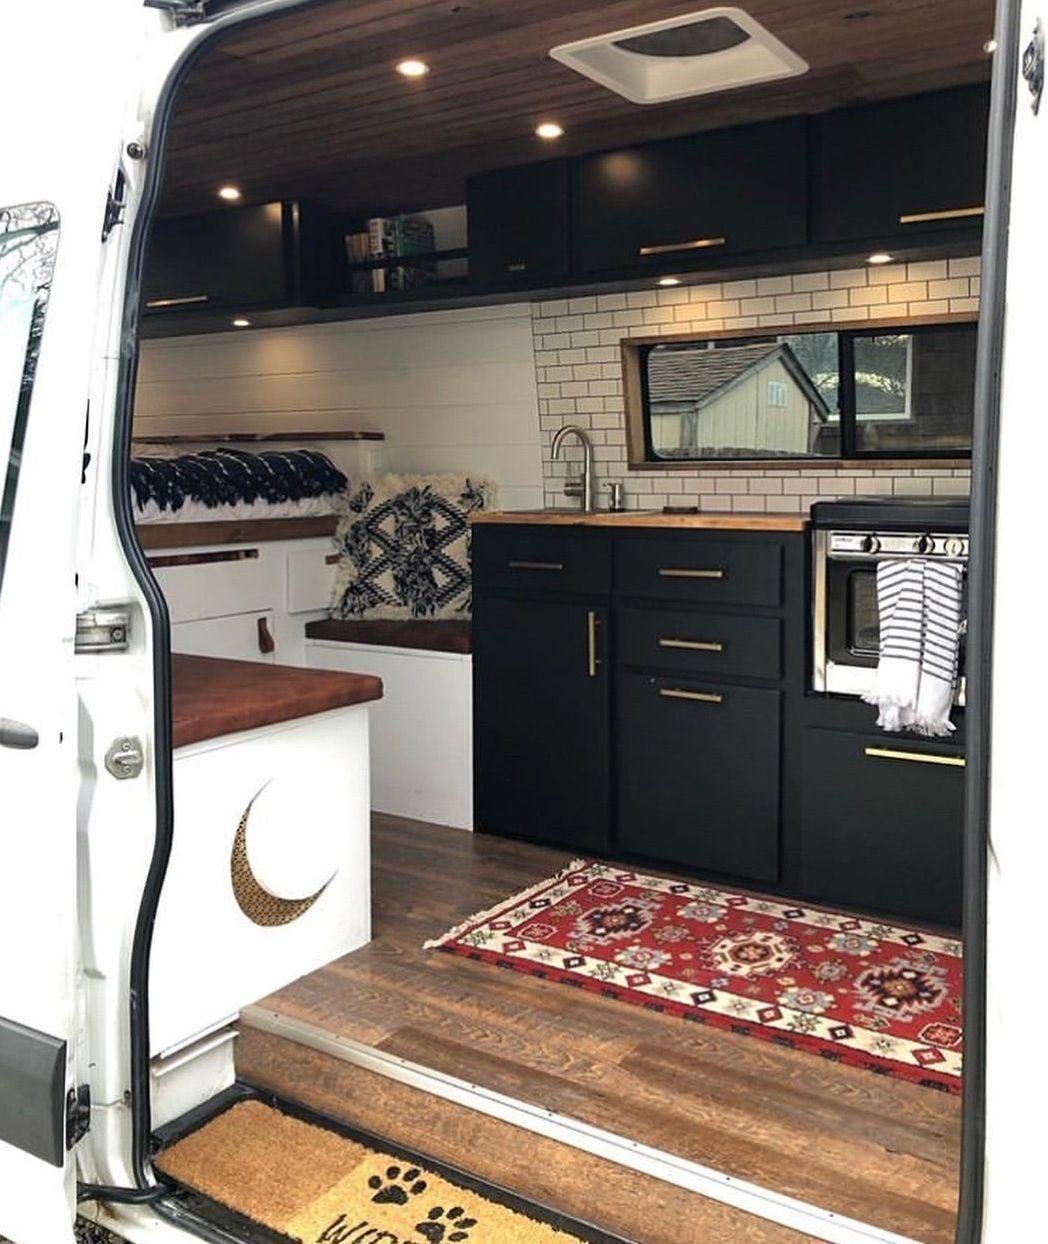 Photo of Brilliant 20 Cool Sprinter Wohnmobil Interieur outdoordecorsm.co … Jede Person…